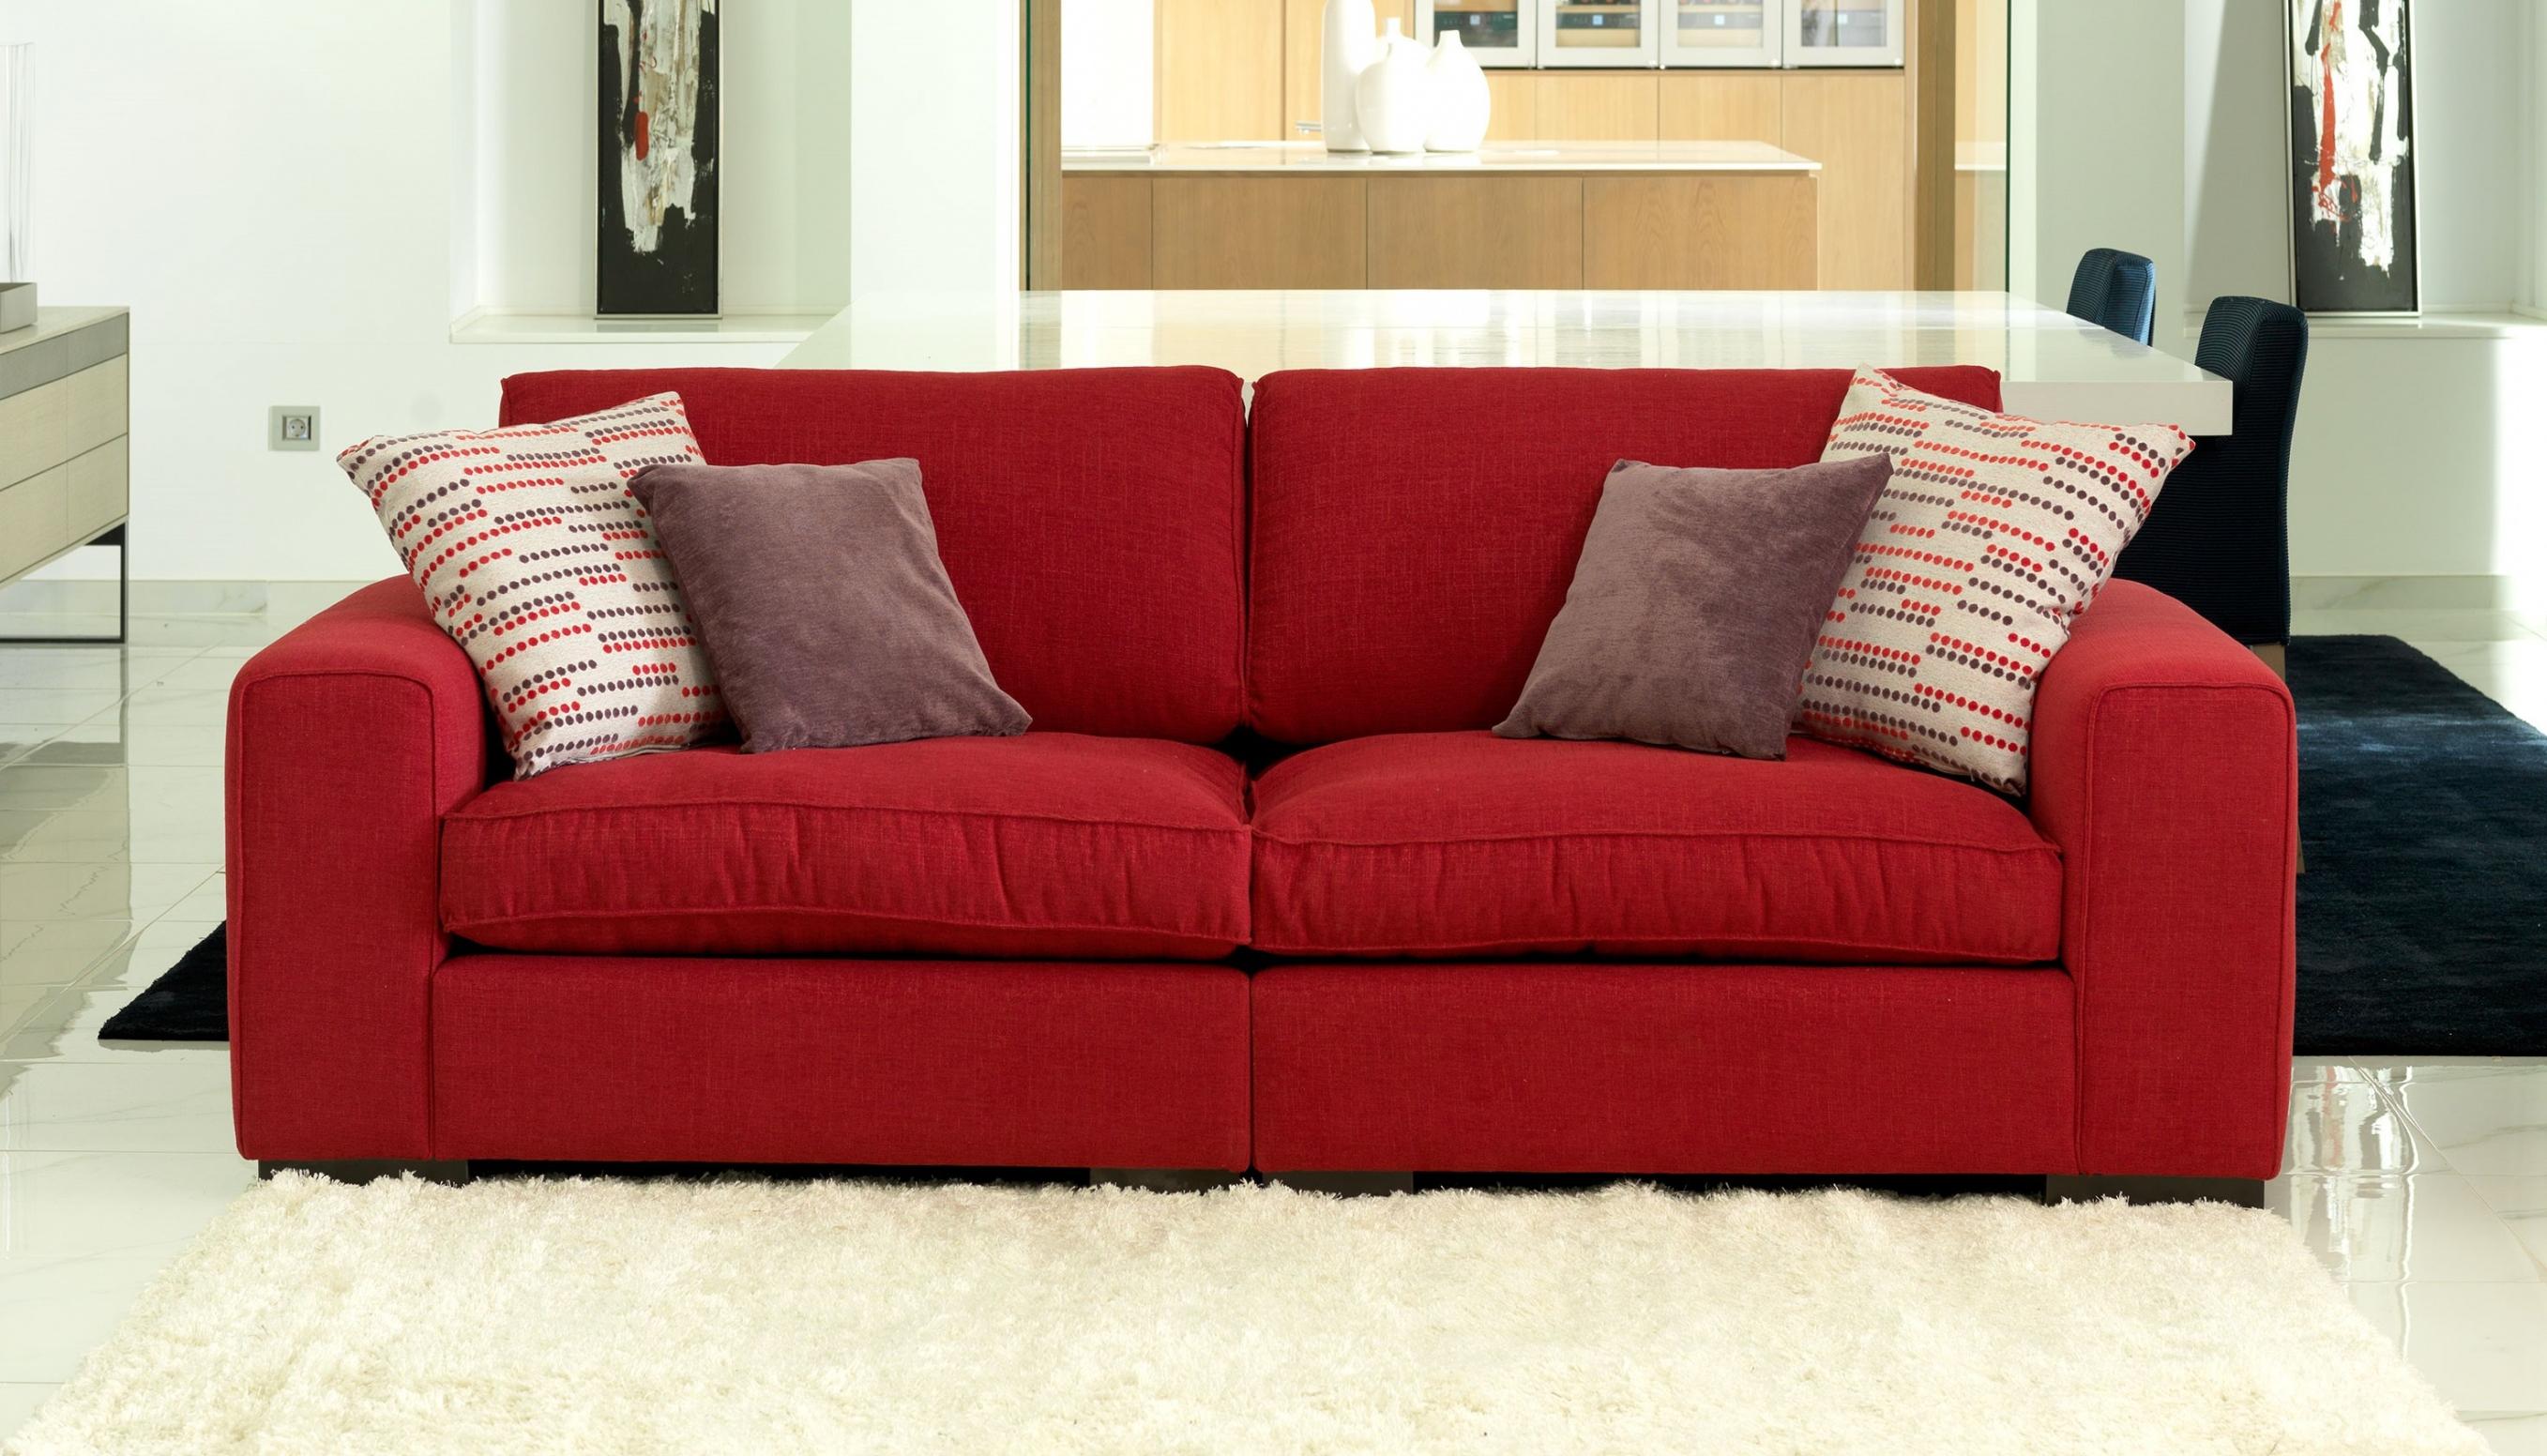 Telas Para sofas Antimanchas E6d5 Telas Para Tapizar sofas Antimanchas Psicologiaymediacion